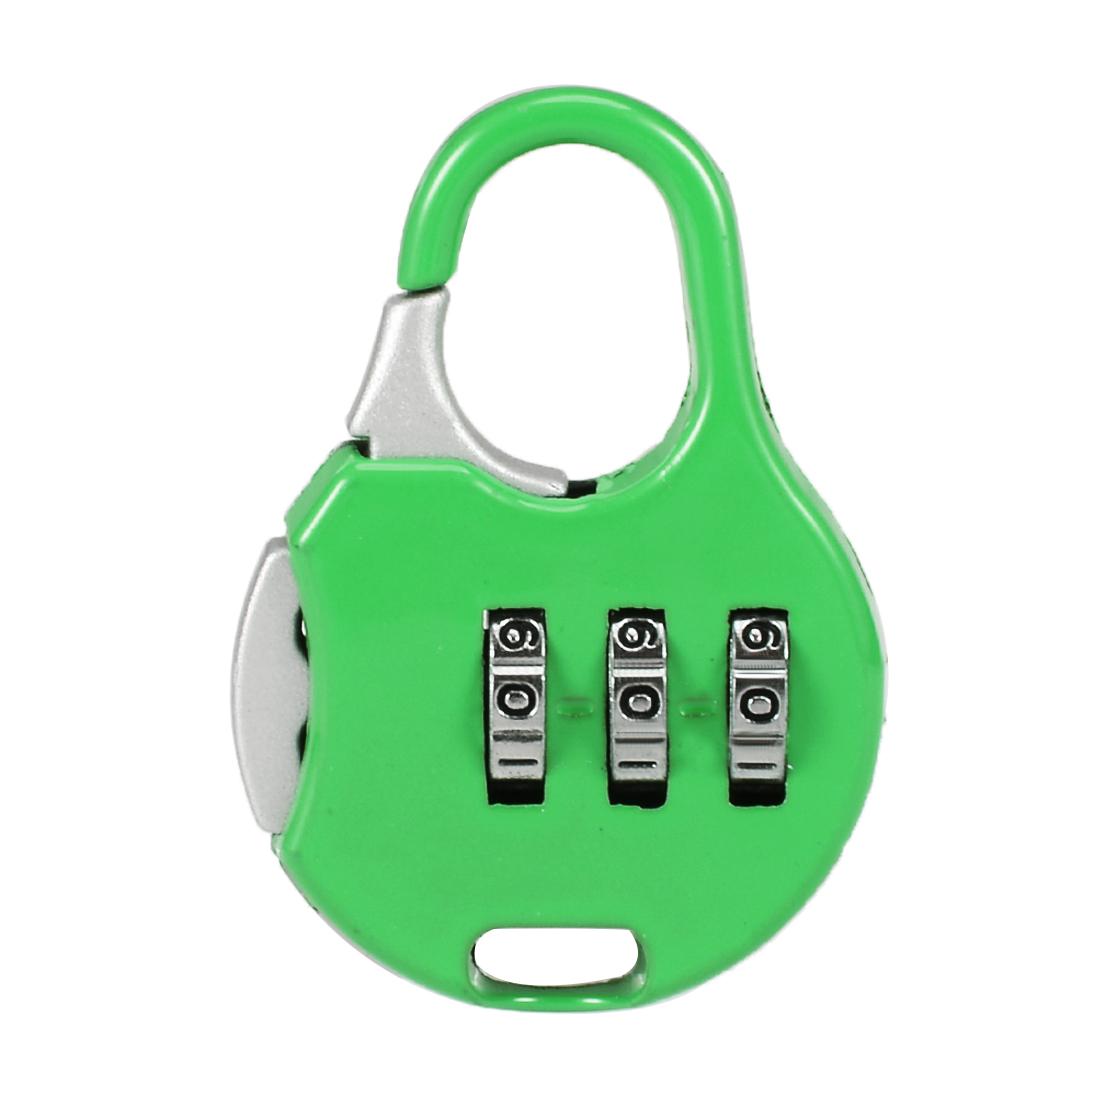 3 Digit Combination Padlock, 3mm Shackle, Zinc Alloy Lock, Green